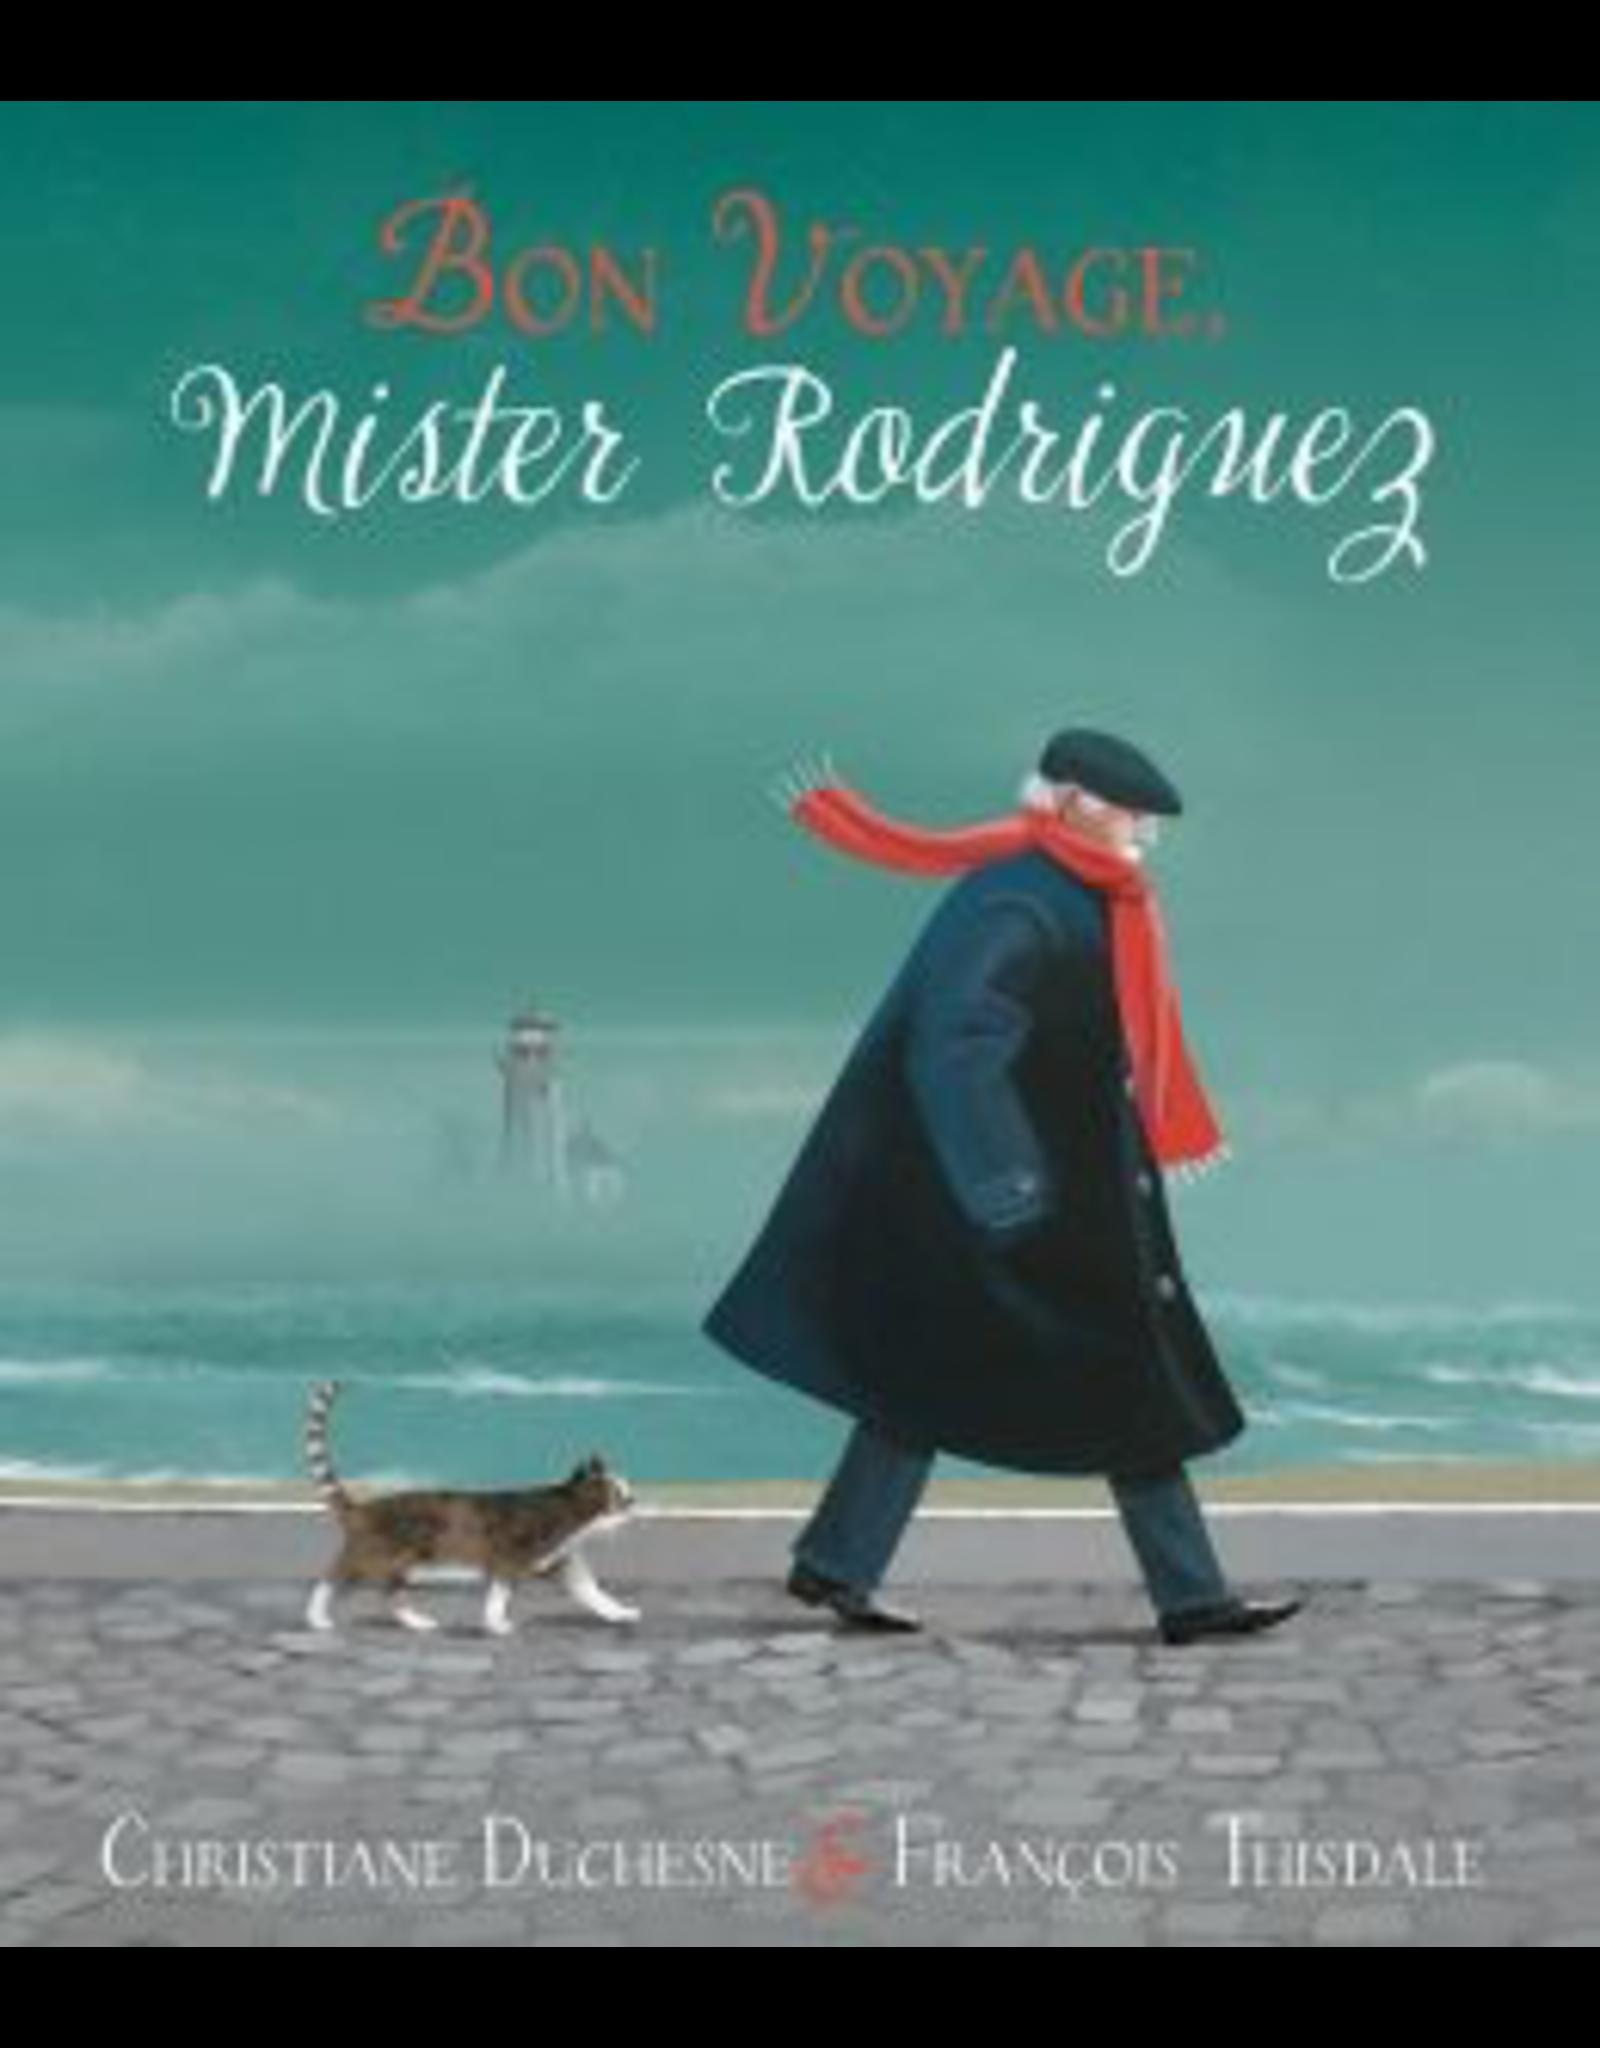 BON VOYAGE, MISTER RODRIGUEZ